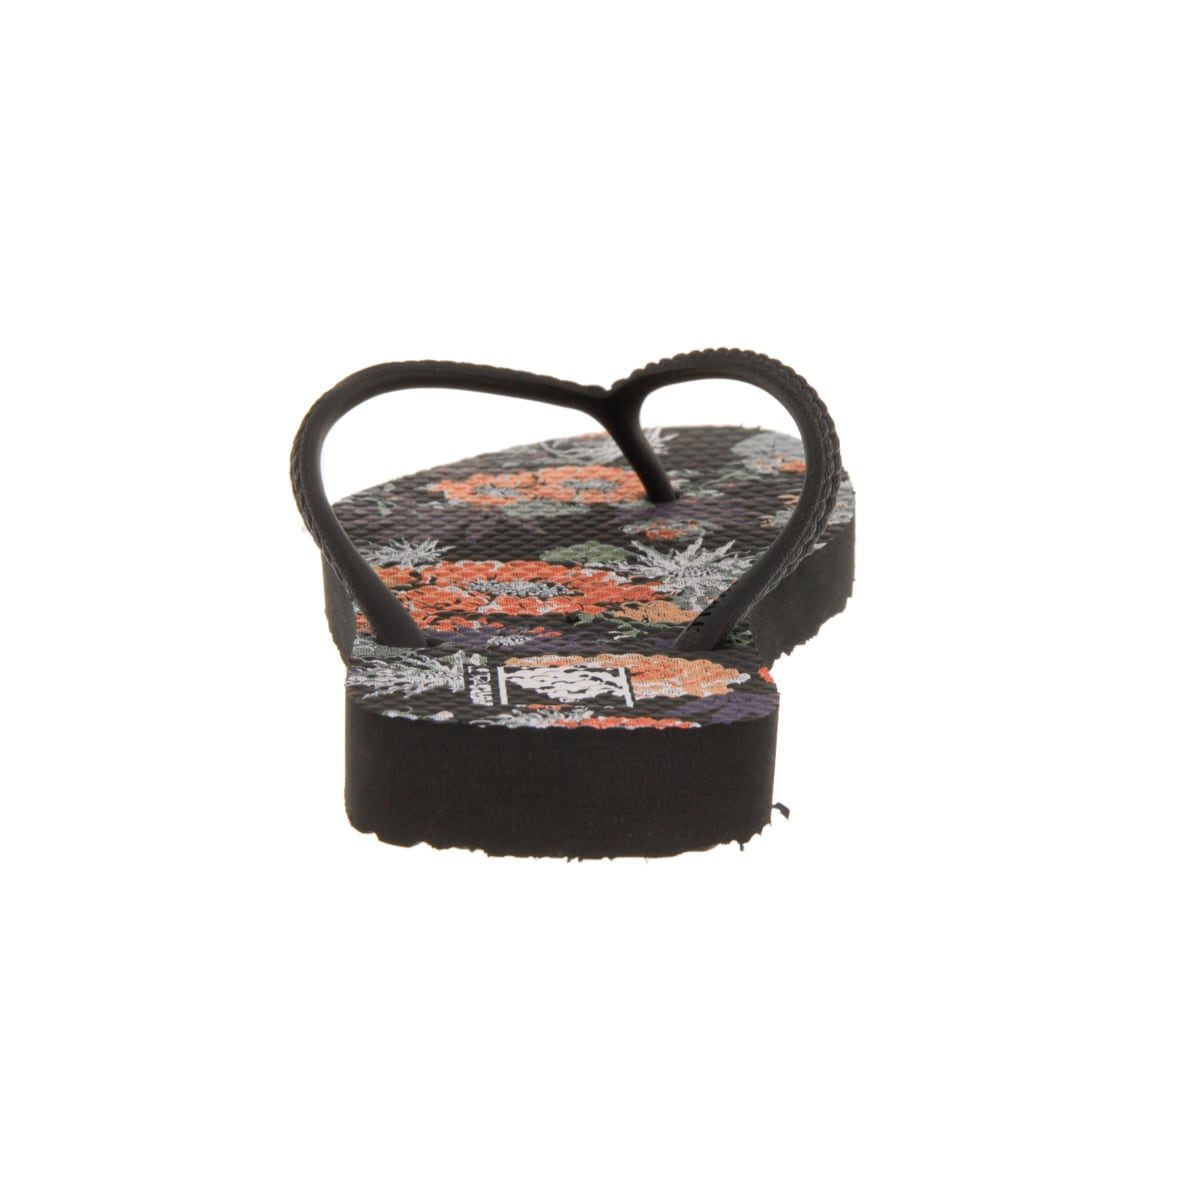 6ecb8ec36aa Shop Vans Women s Hanelei (Desert Floral) Black Floral Print Sandal - Free  Shipping On Orders Over  45 - Overstock.com - 13344240